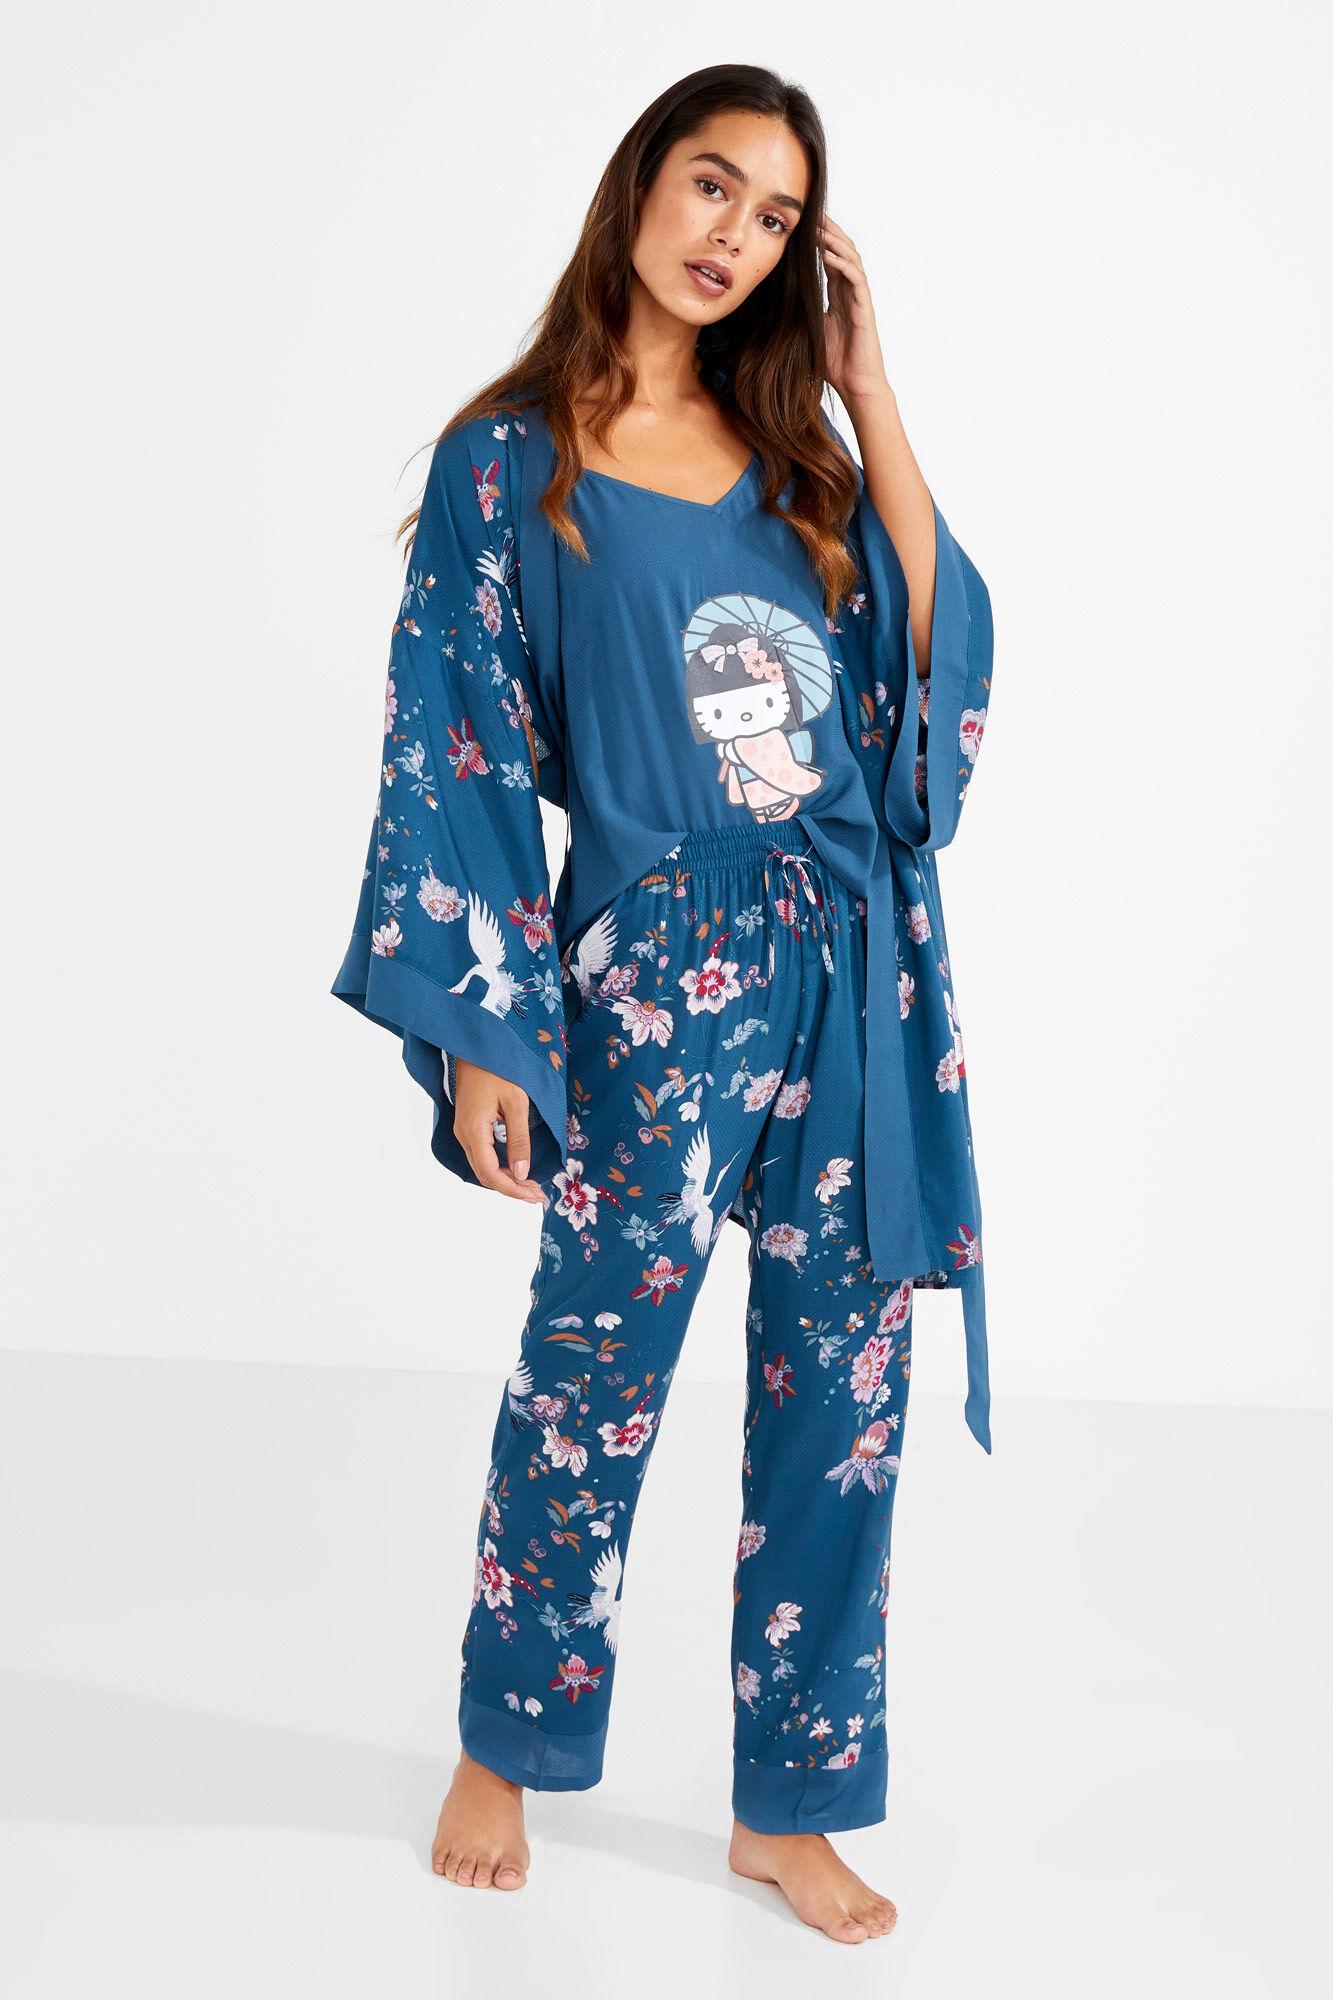 776fa5879 Hello Kitty pyjama set | Long pyjamas | Women'secret